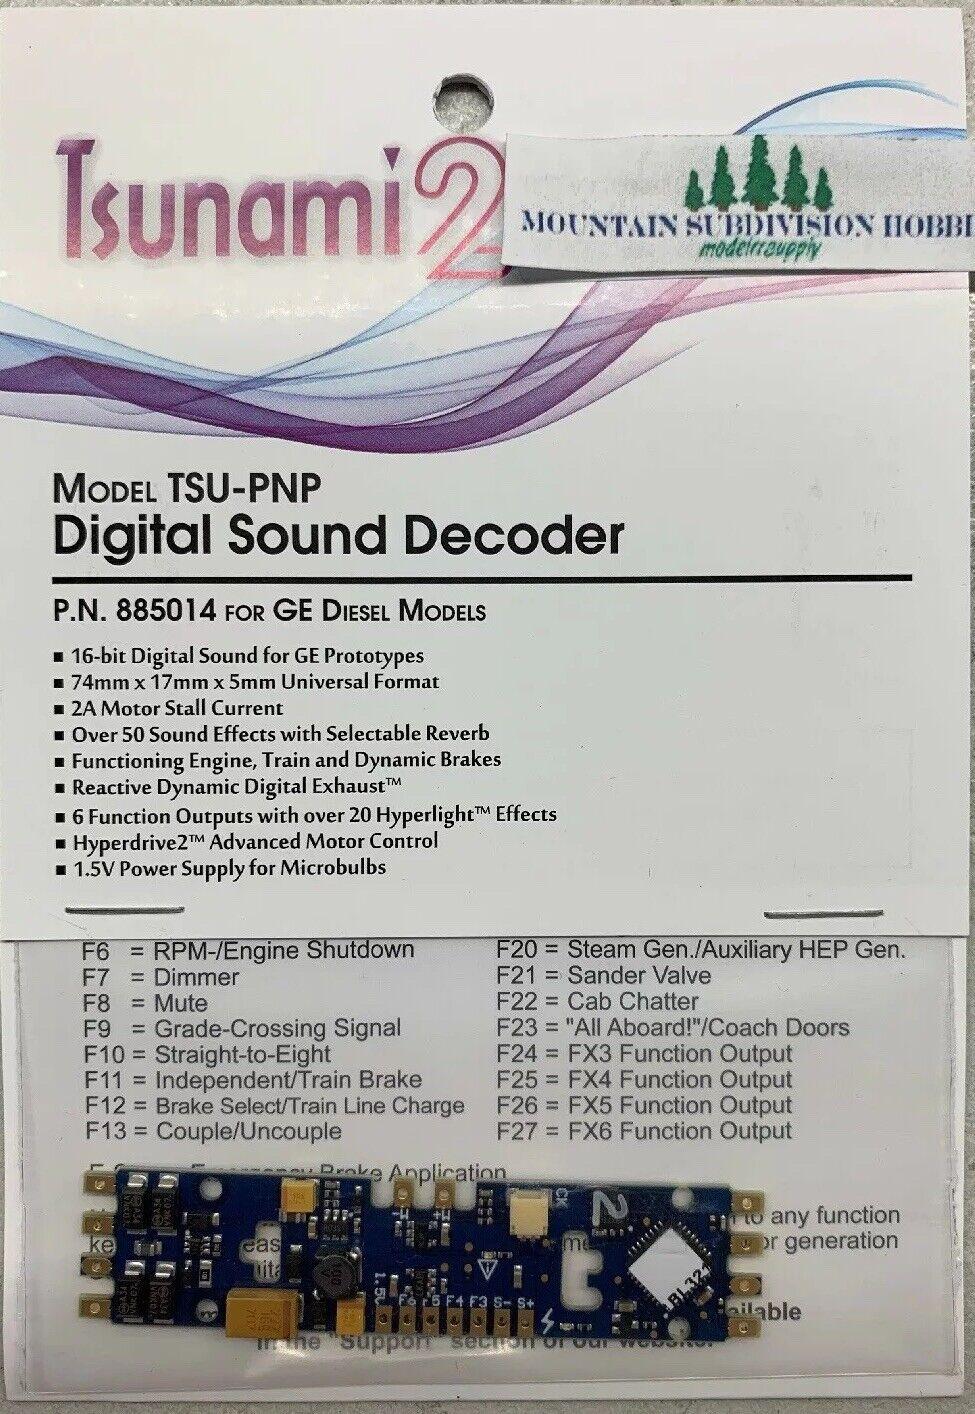 Soundtraxx 885014 Tsunami 2 TSU-PNP GE DIESEL DCC Snd Decoder V1.2 MODELRRSUPPLY